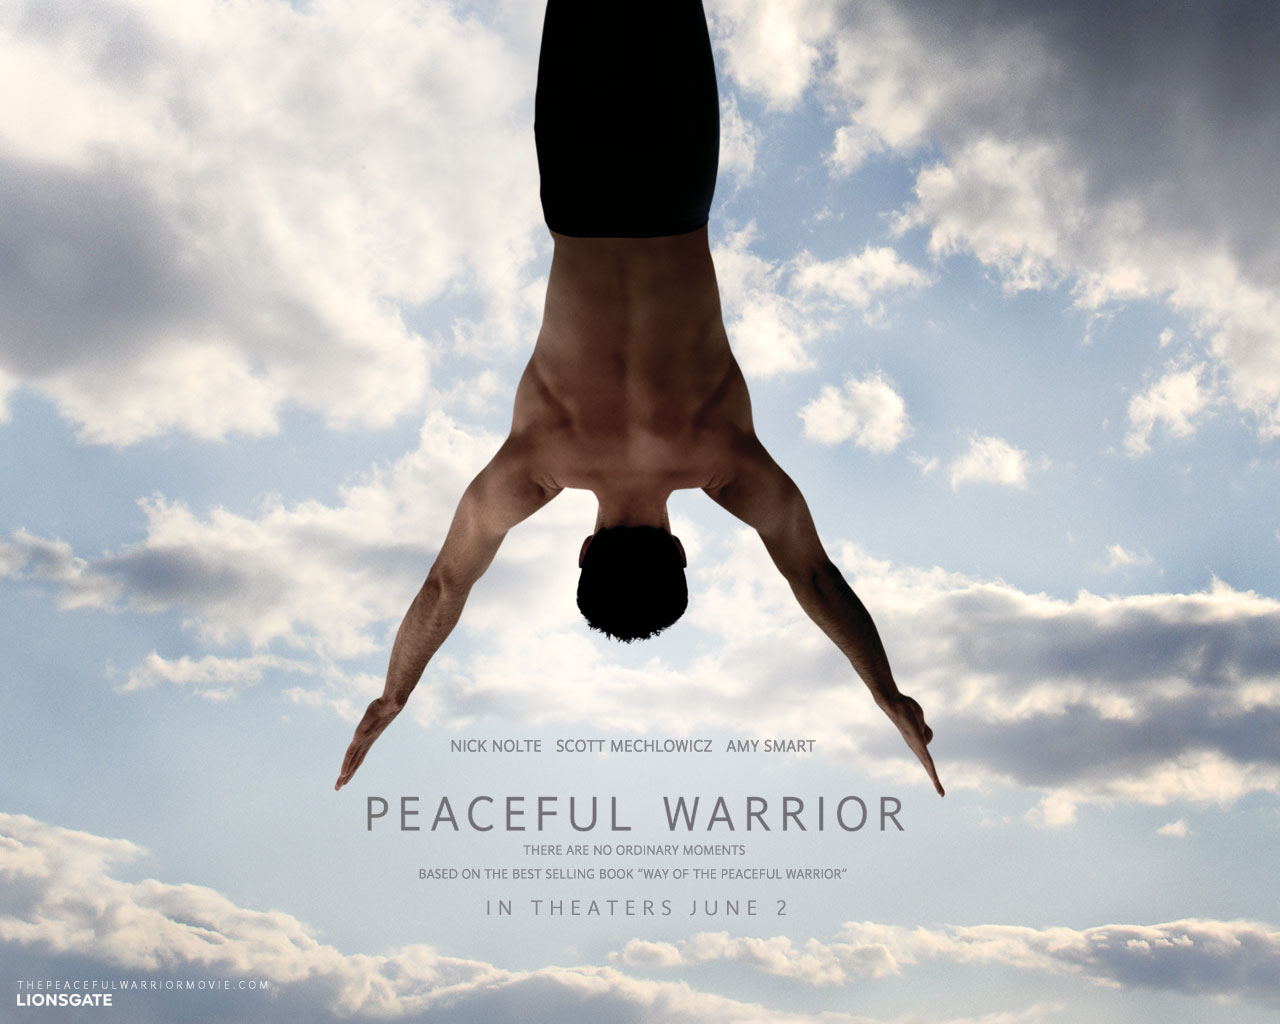 , Te invito a ser un guerrero pacífico